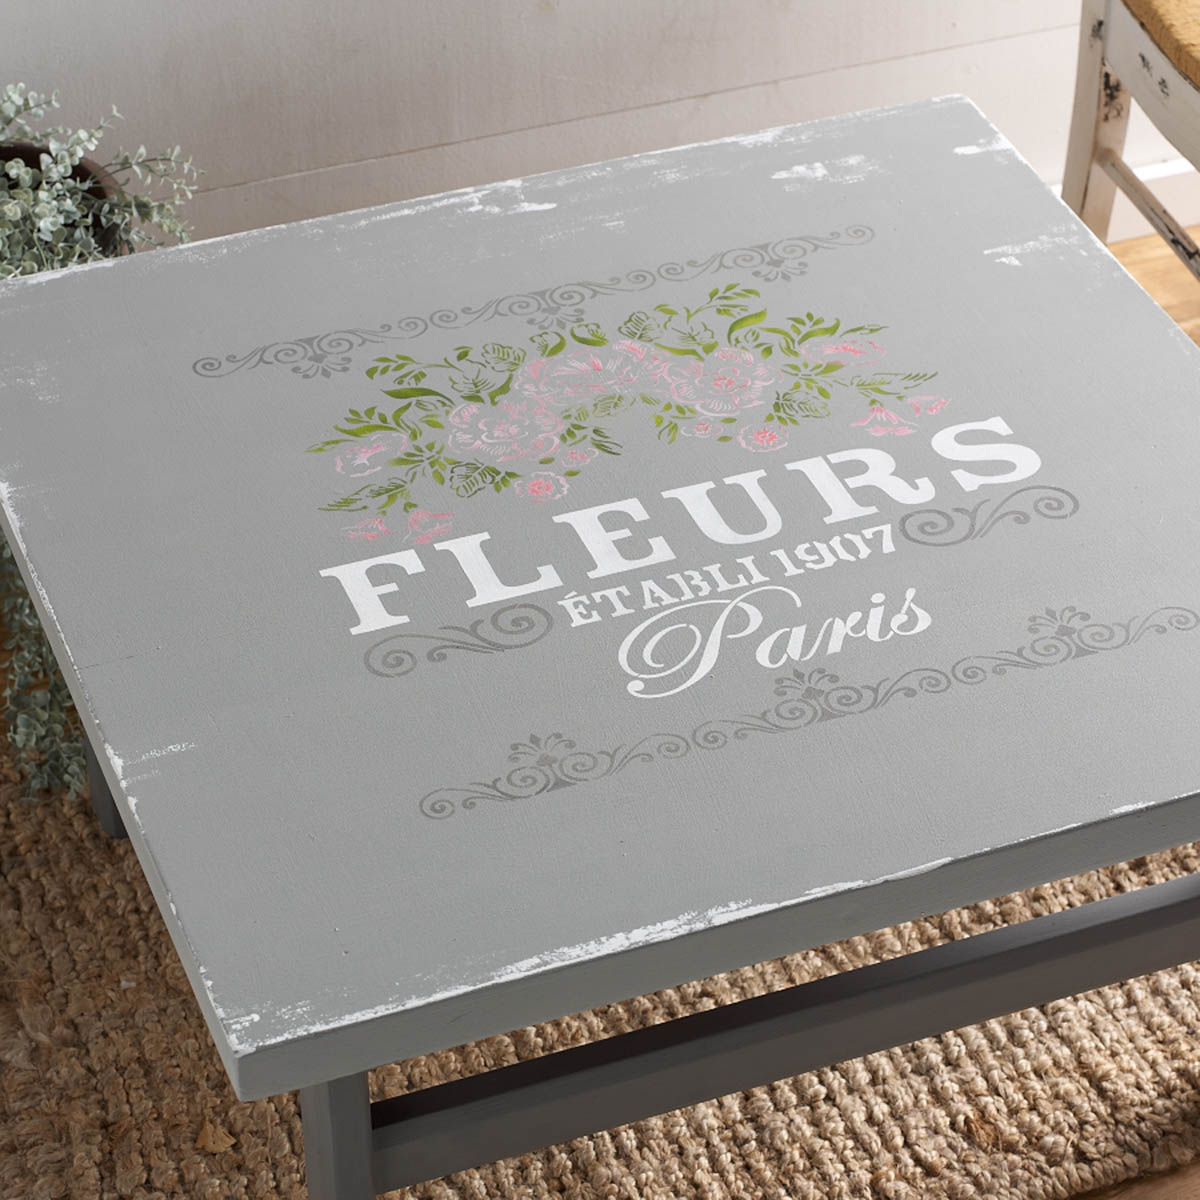 FolkArt ® Painting Stencils - Wall, Floor & Furniture - Fleurs